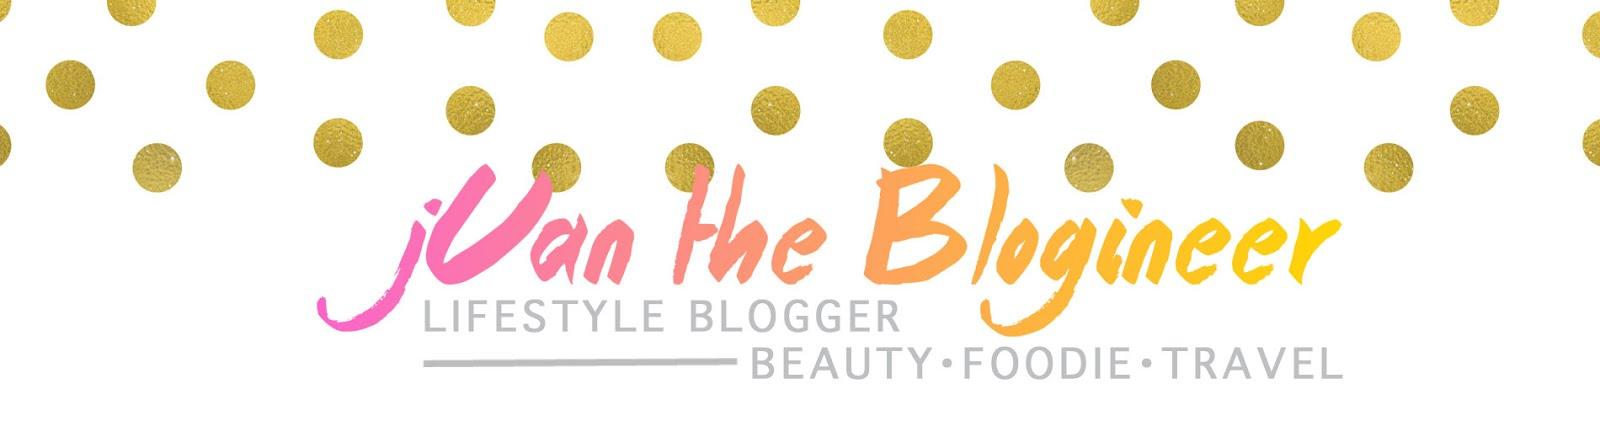 jUan the Blogineer